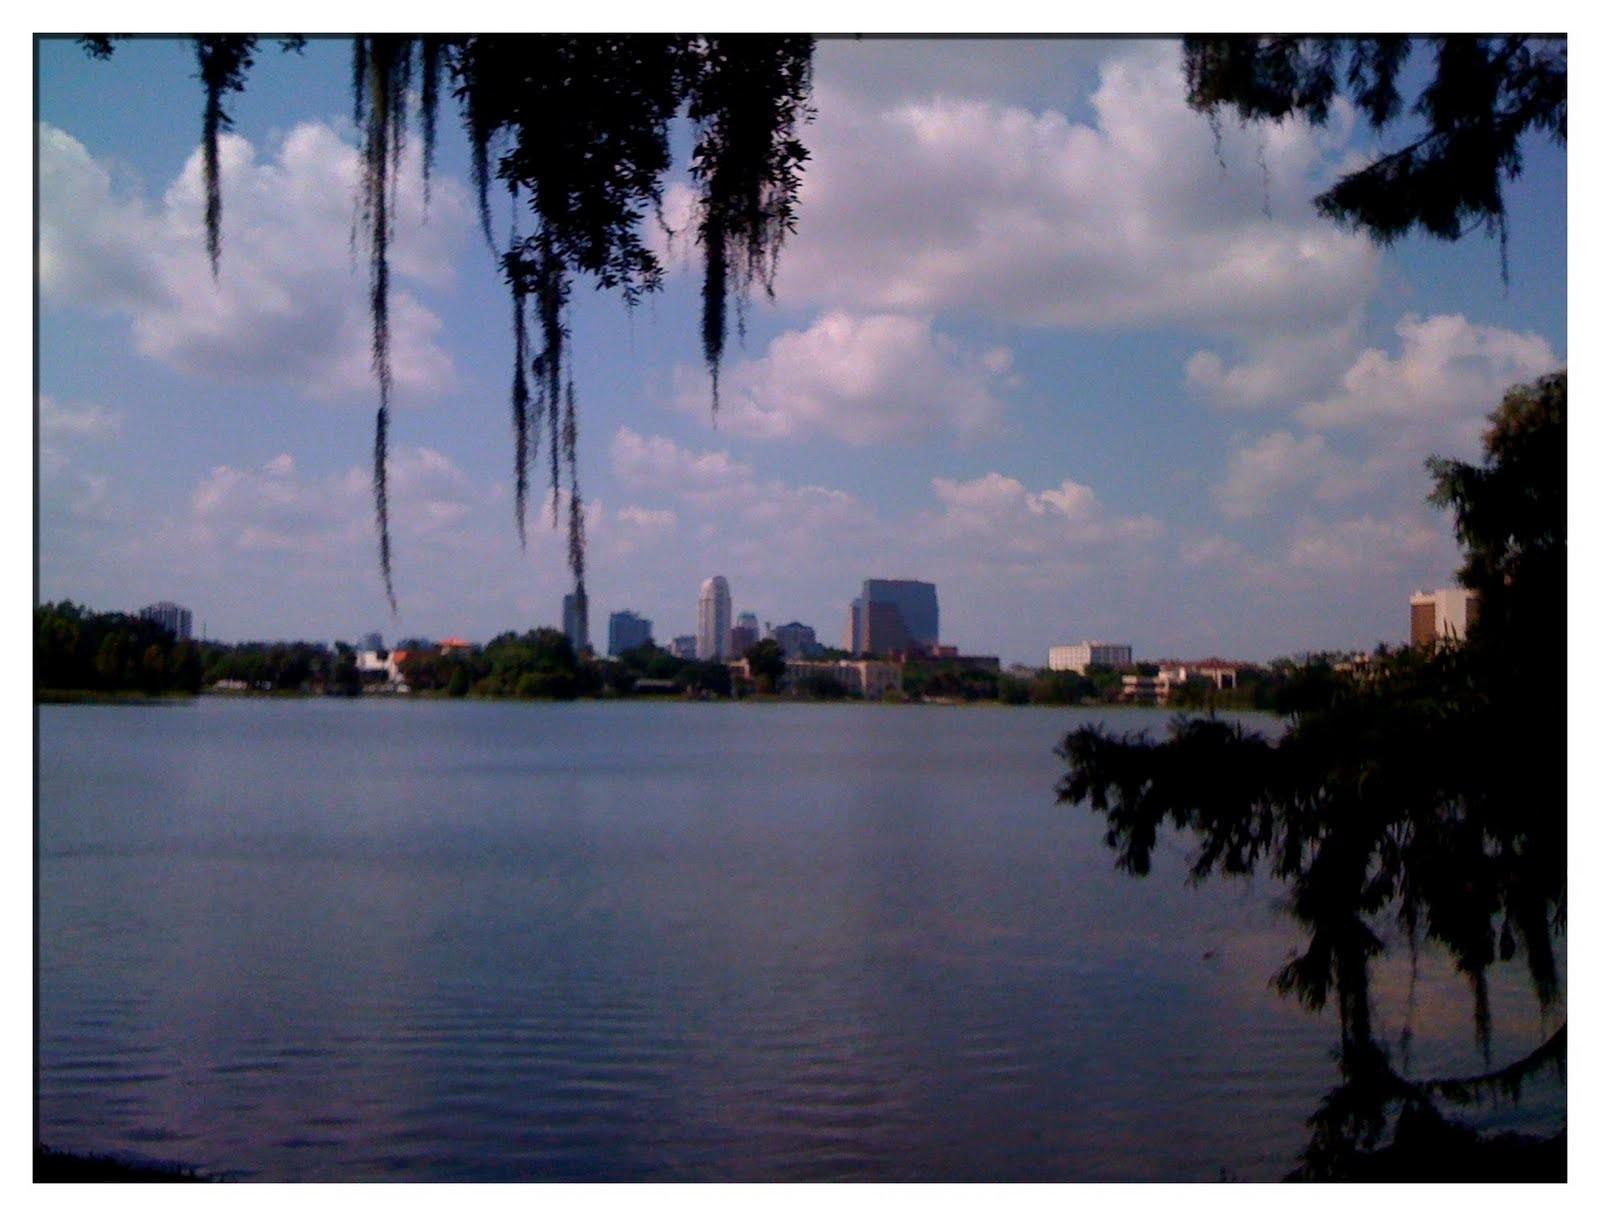 via Exploring Orlando